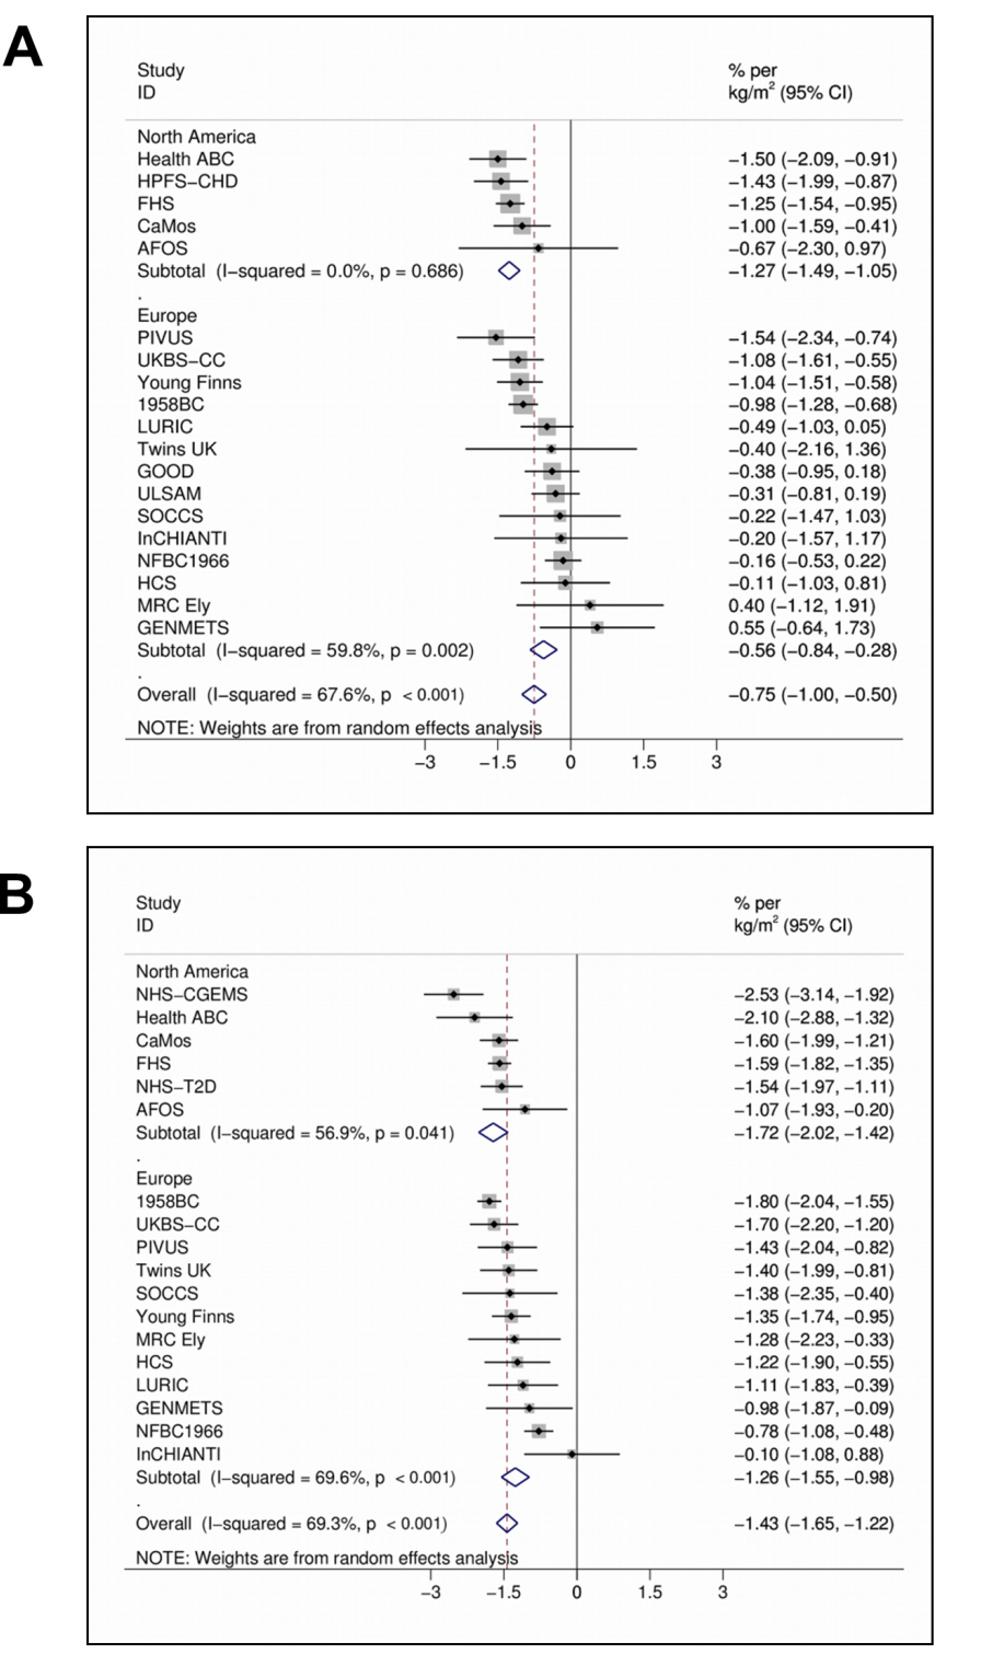 Random effects meta-analysis of the BMI association with 25(OH)D in men (A) (<i>n</i>=20,950) and women (B) (<i>n</i>=21,074).